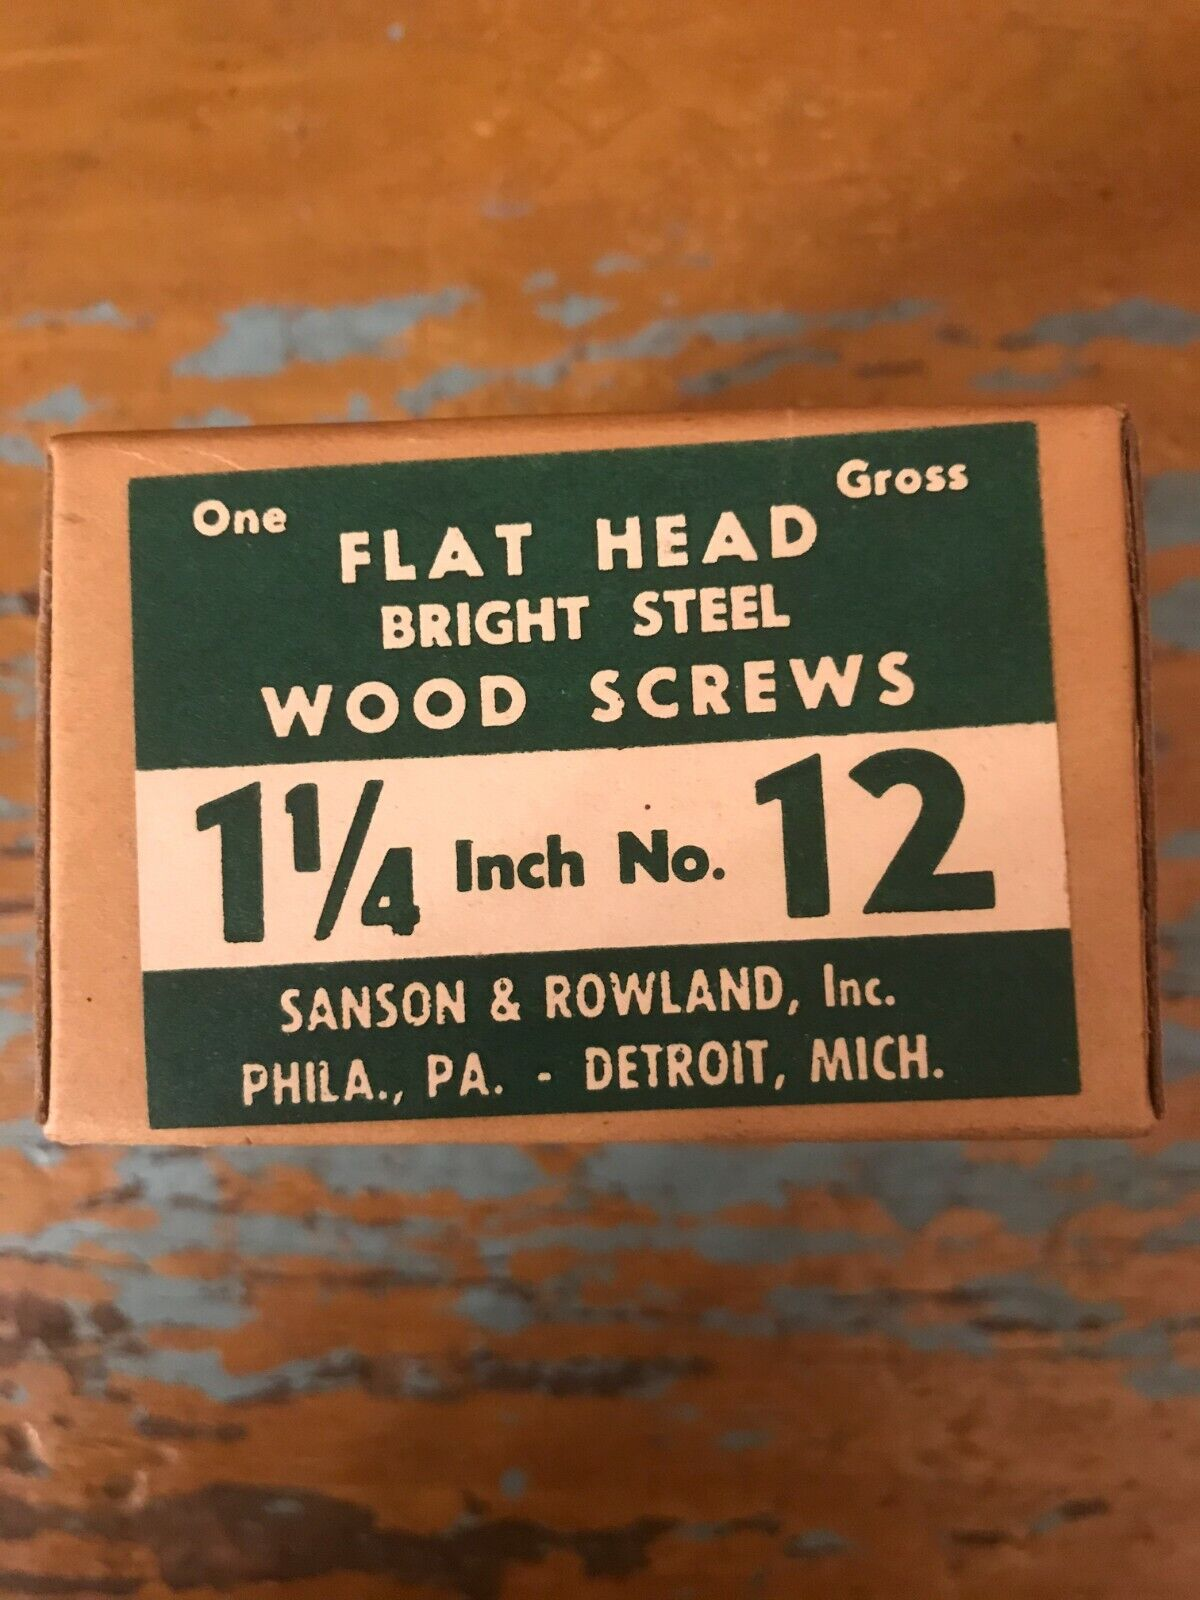 Lot-flat Head Wood Screws 12 1 1/4 Long-1.41 Pounds - $10.00